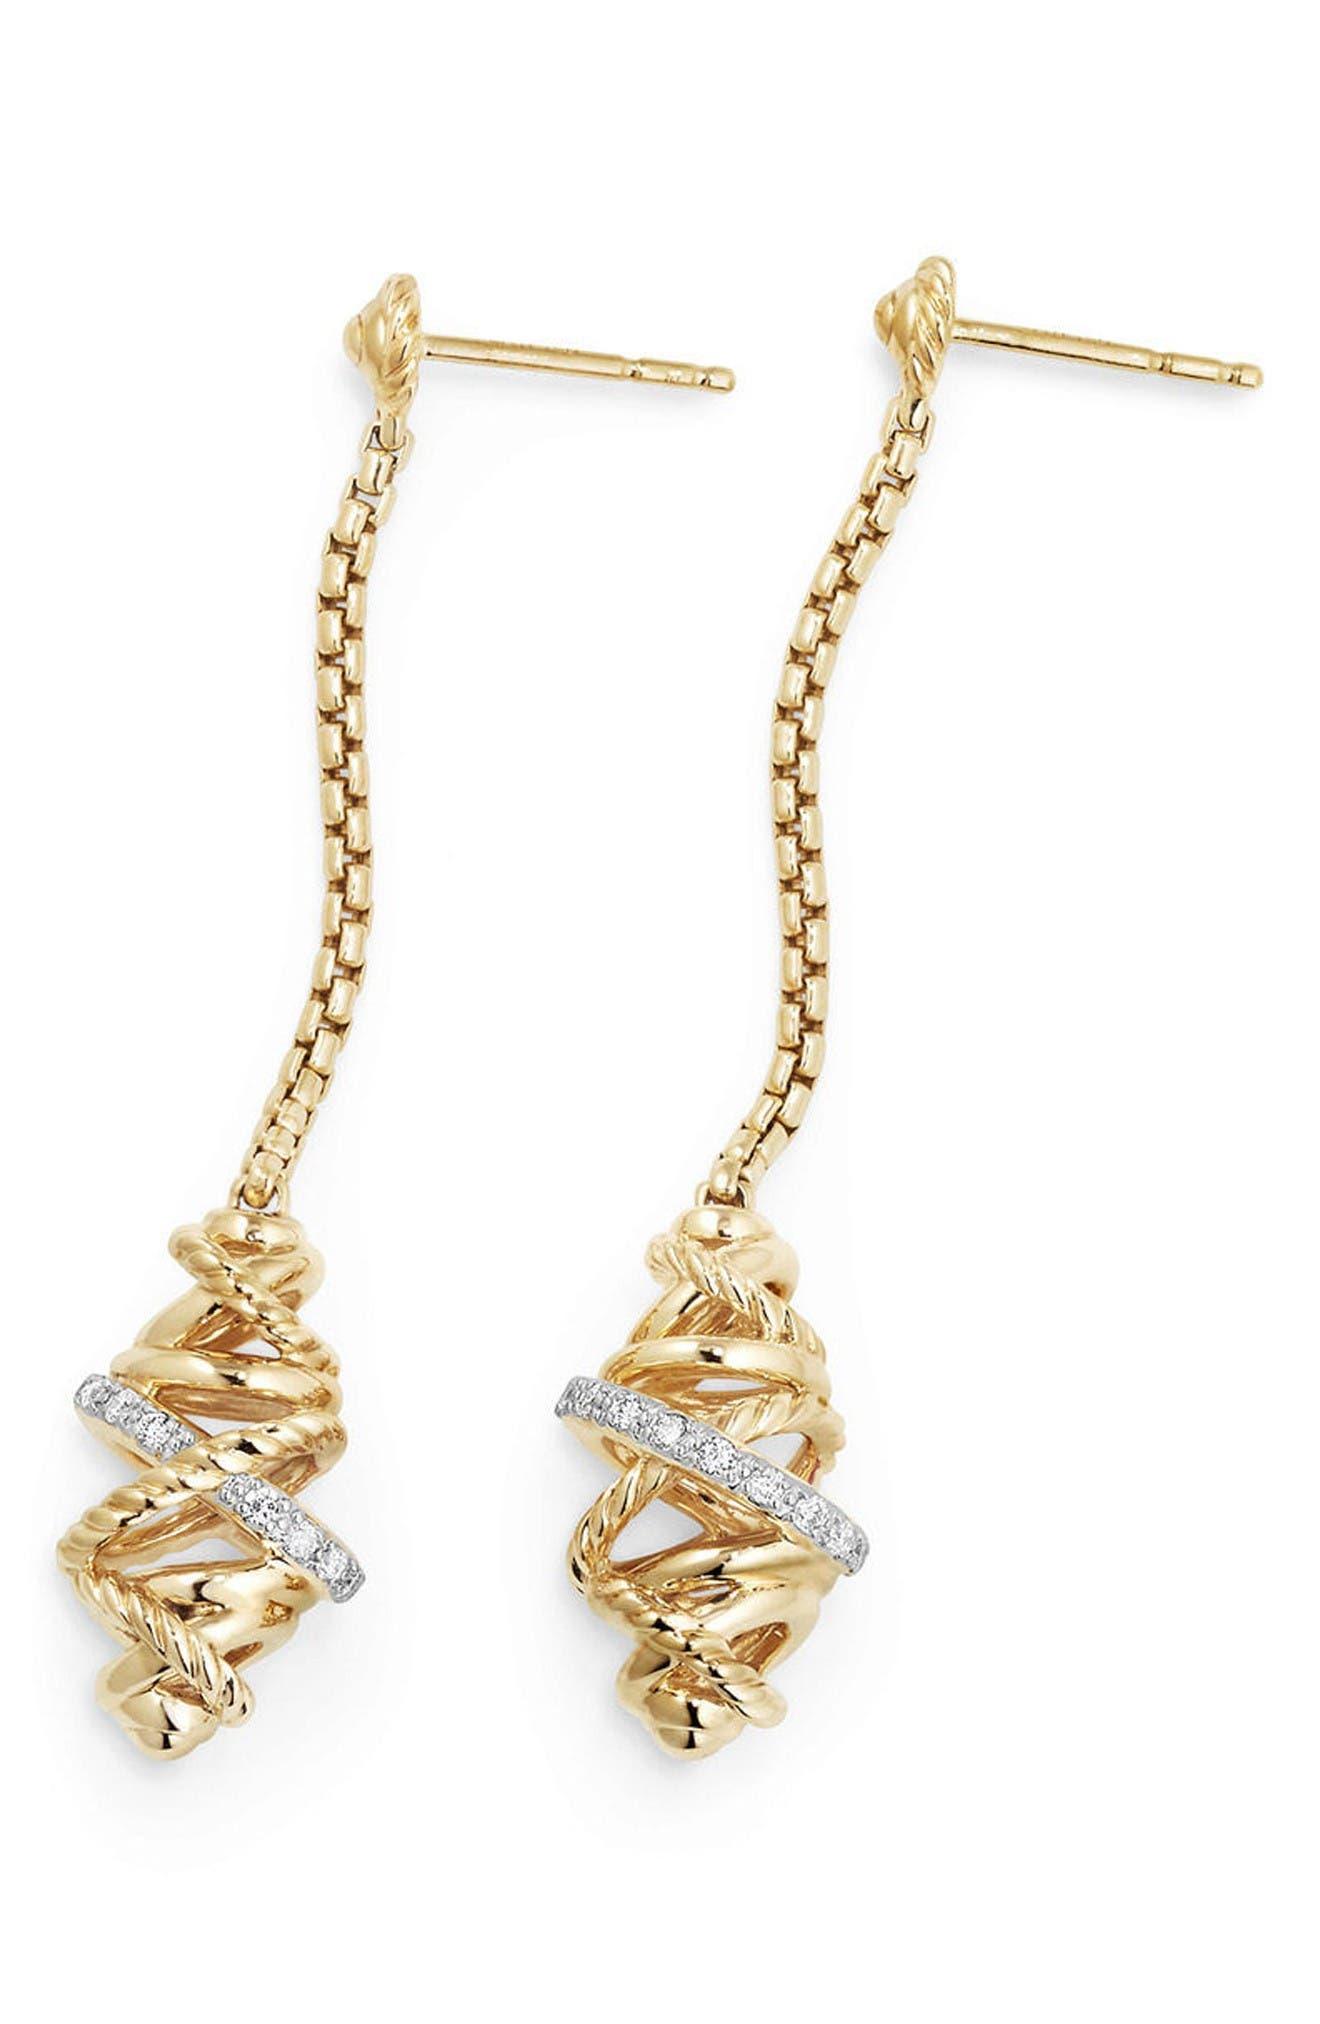 Alternate Image 2  - David Yurman Crossover Chain Drop Earrings with Diamonds in 18K Gold